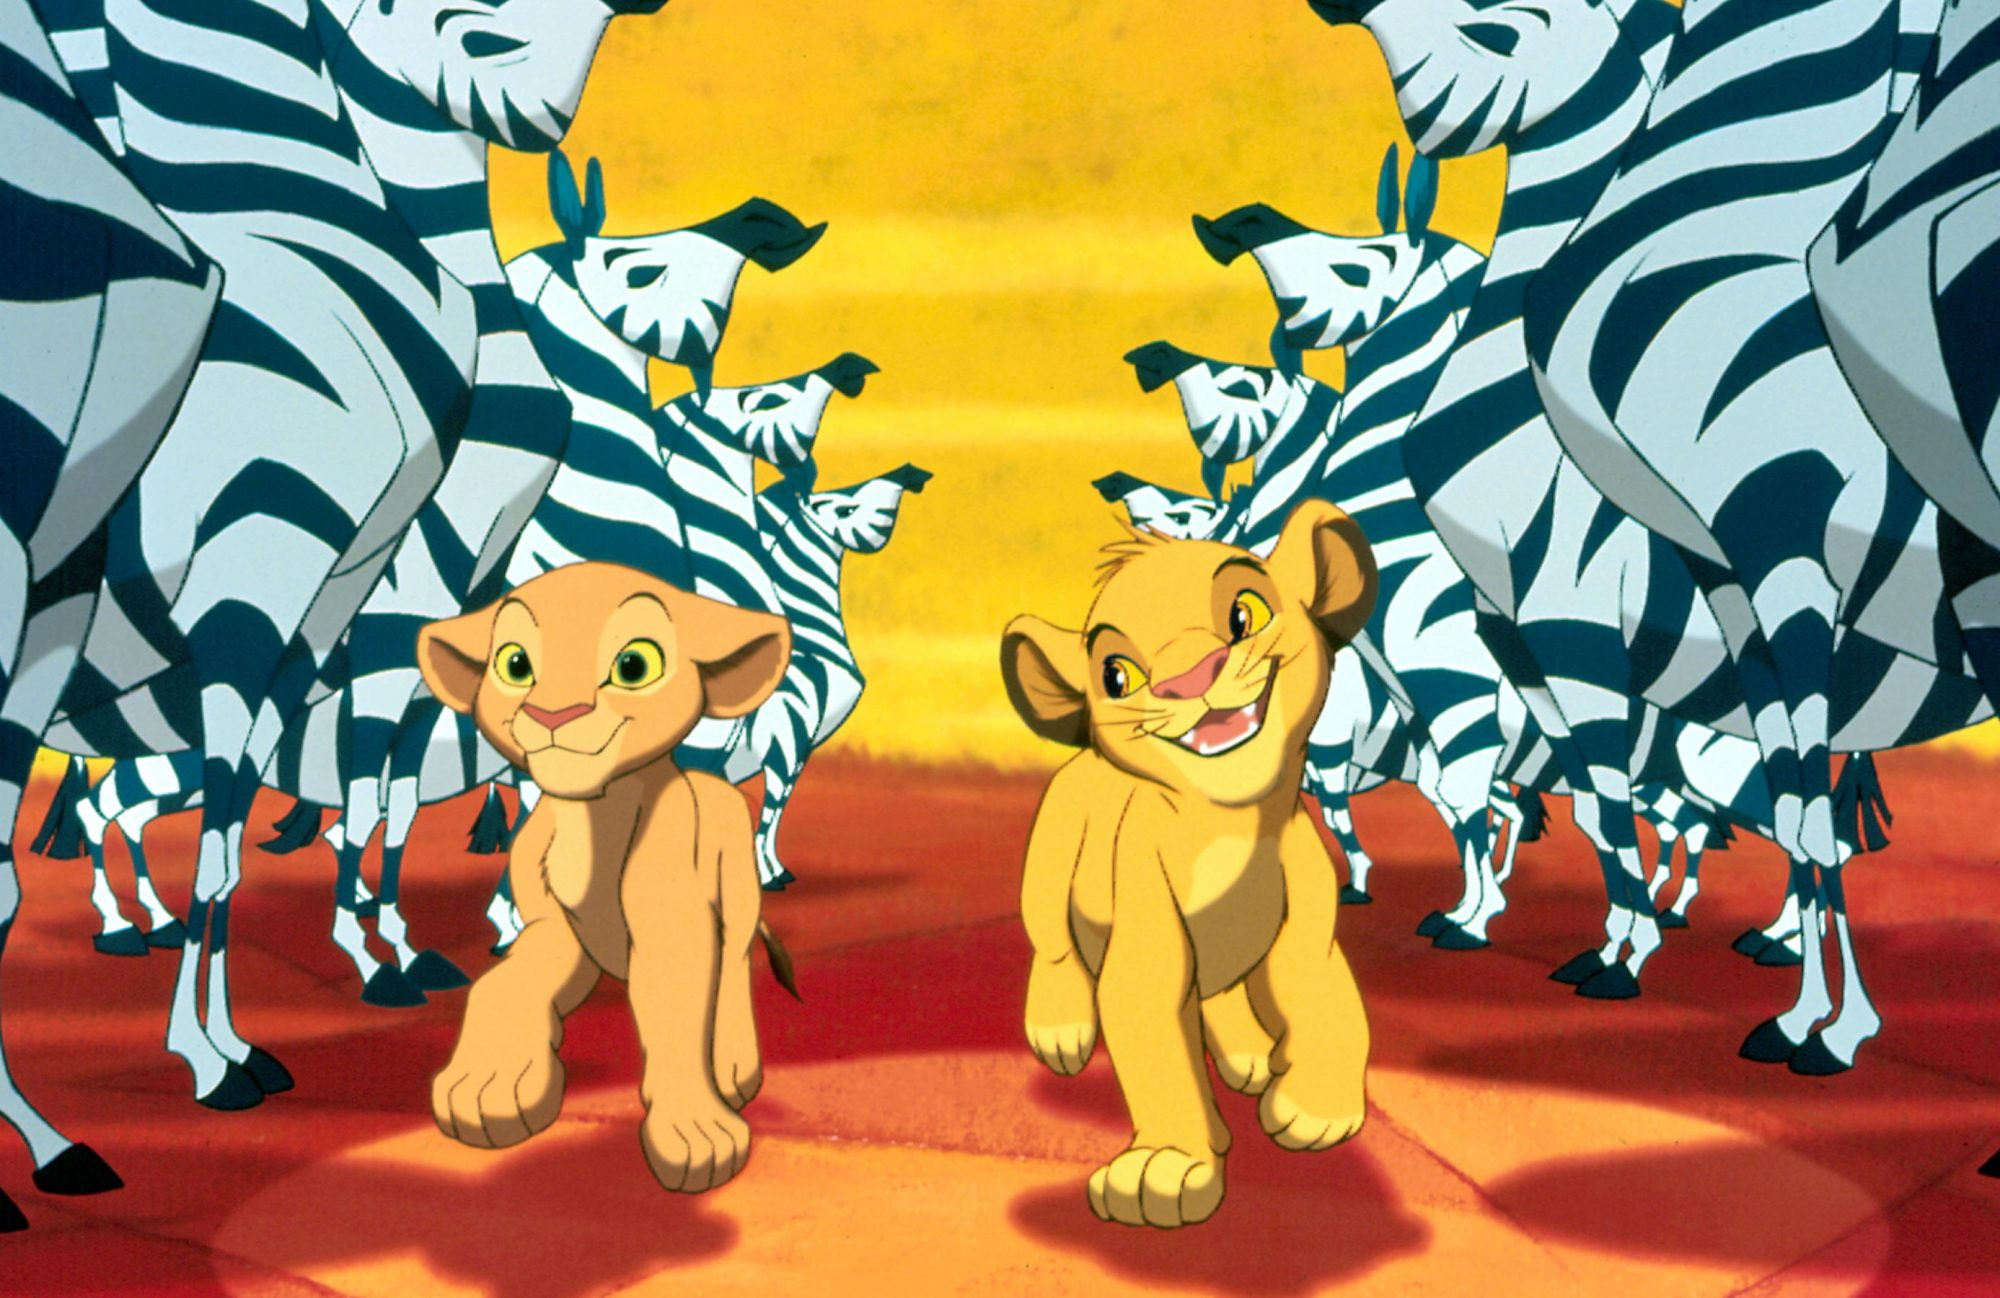 THE LION KING, Nala, Simba, 1994. ©Buena Vista Pictures/Courtesy Everett Collection